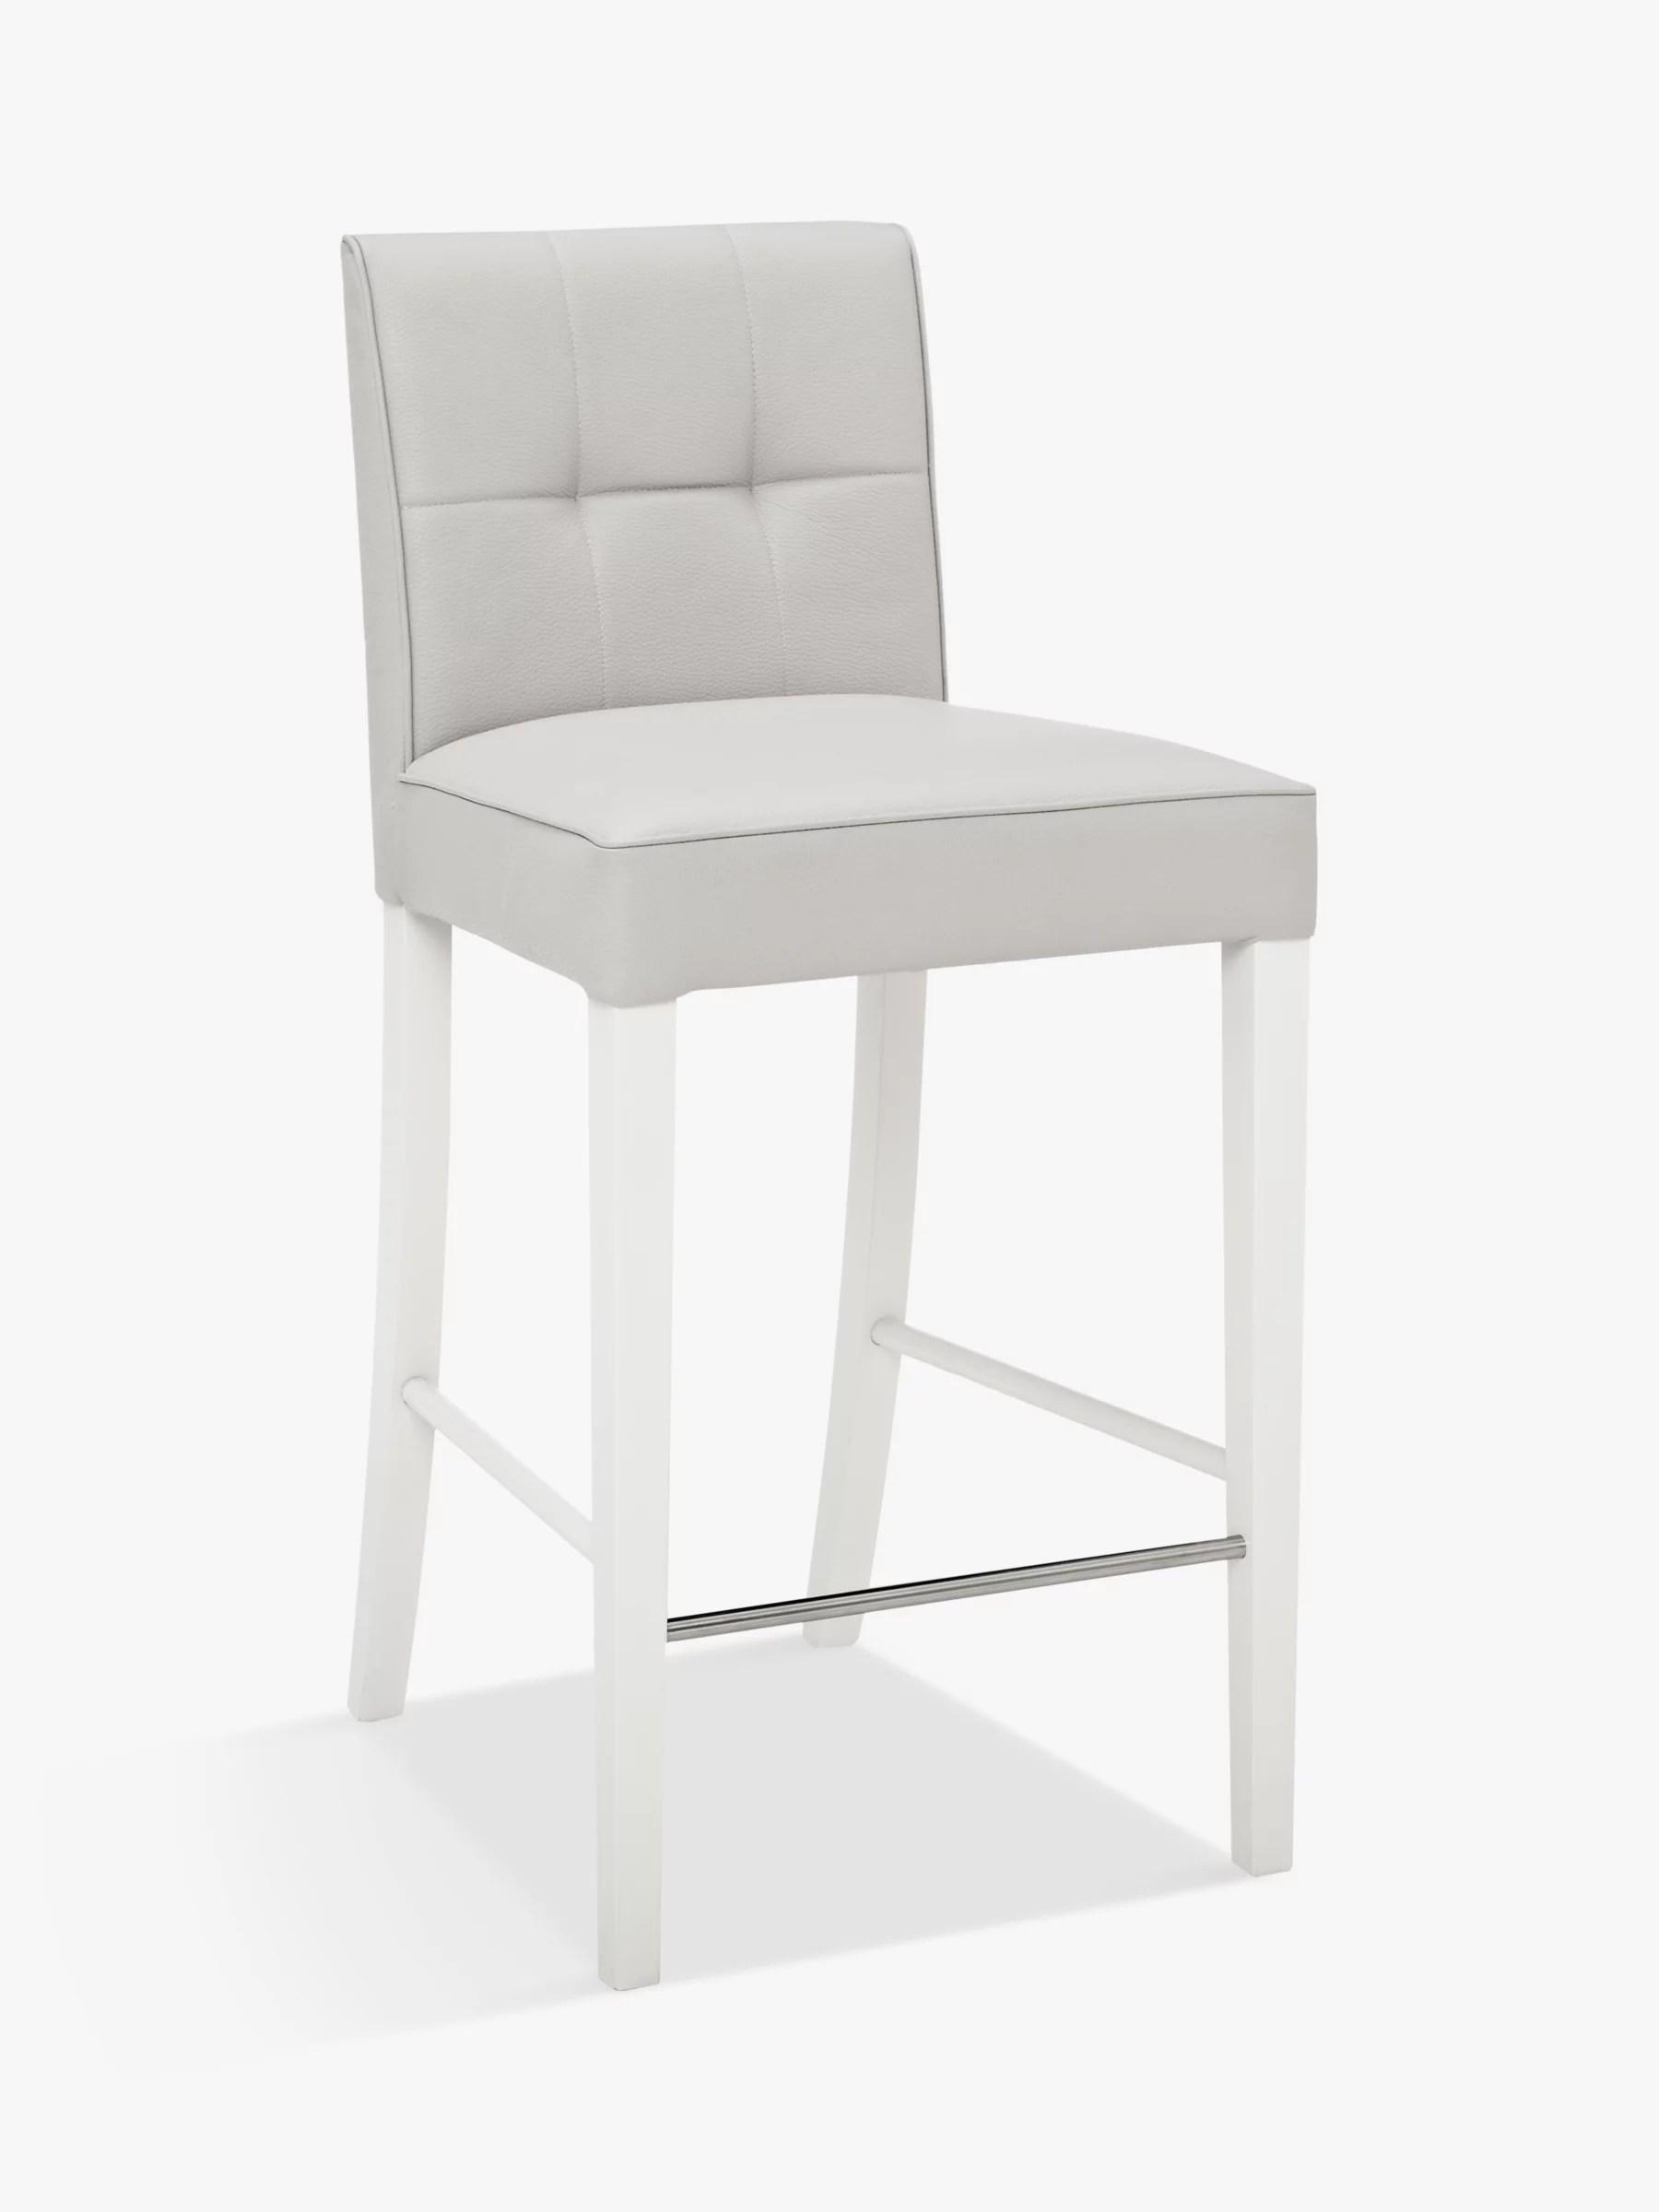 John Lewis Simone Faux Leather Bar Chair, Grey at John Lewis